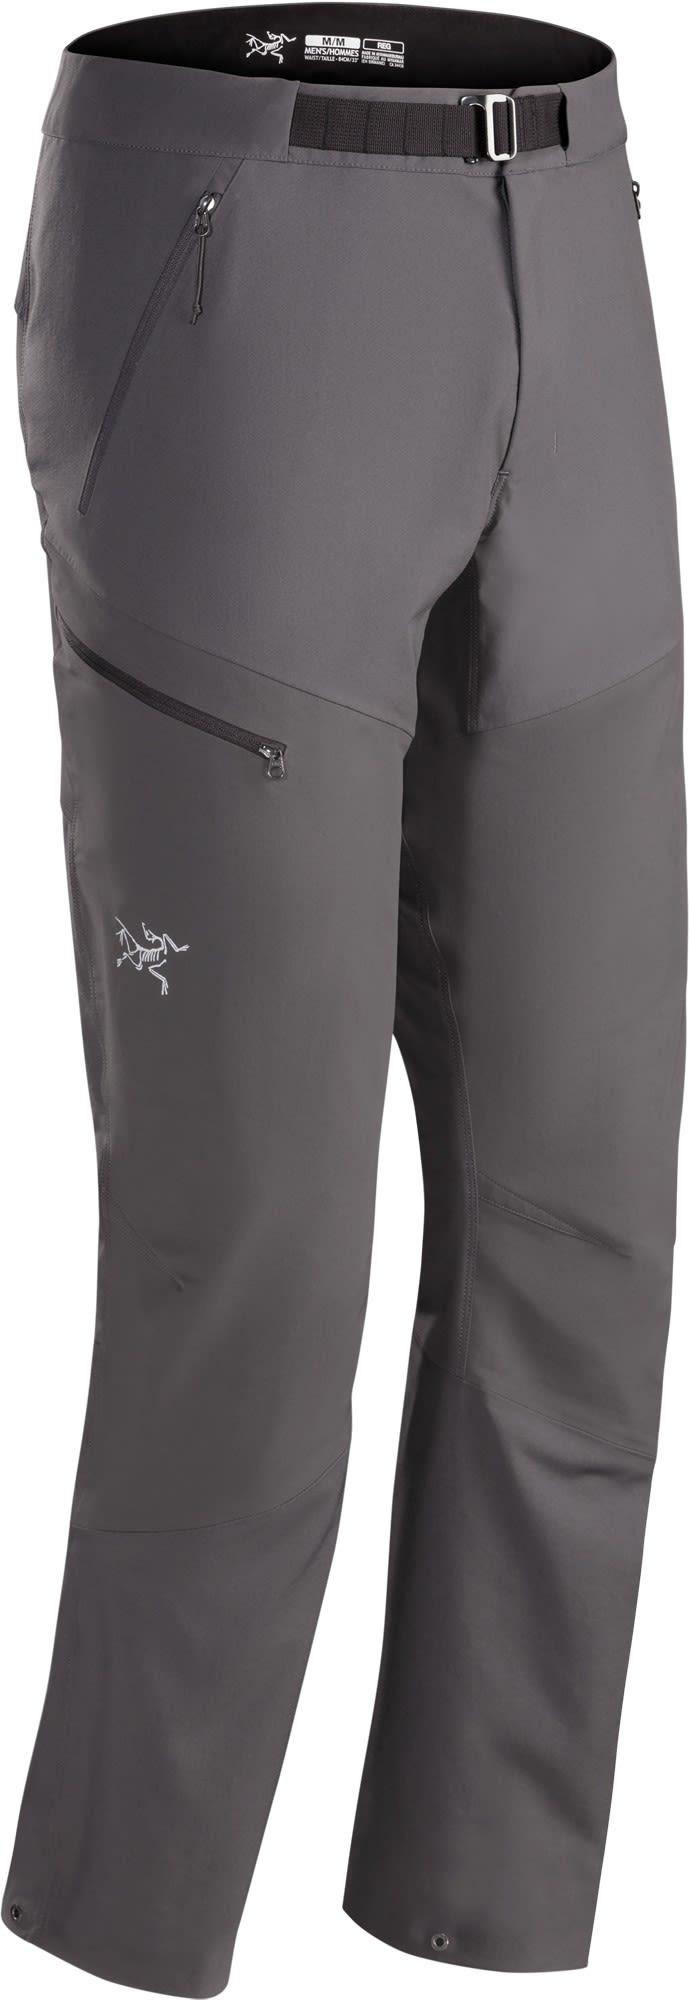 Arcteryx Sigma FL Pants Grau, Male Hose, S